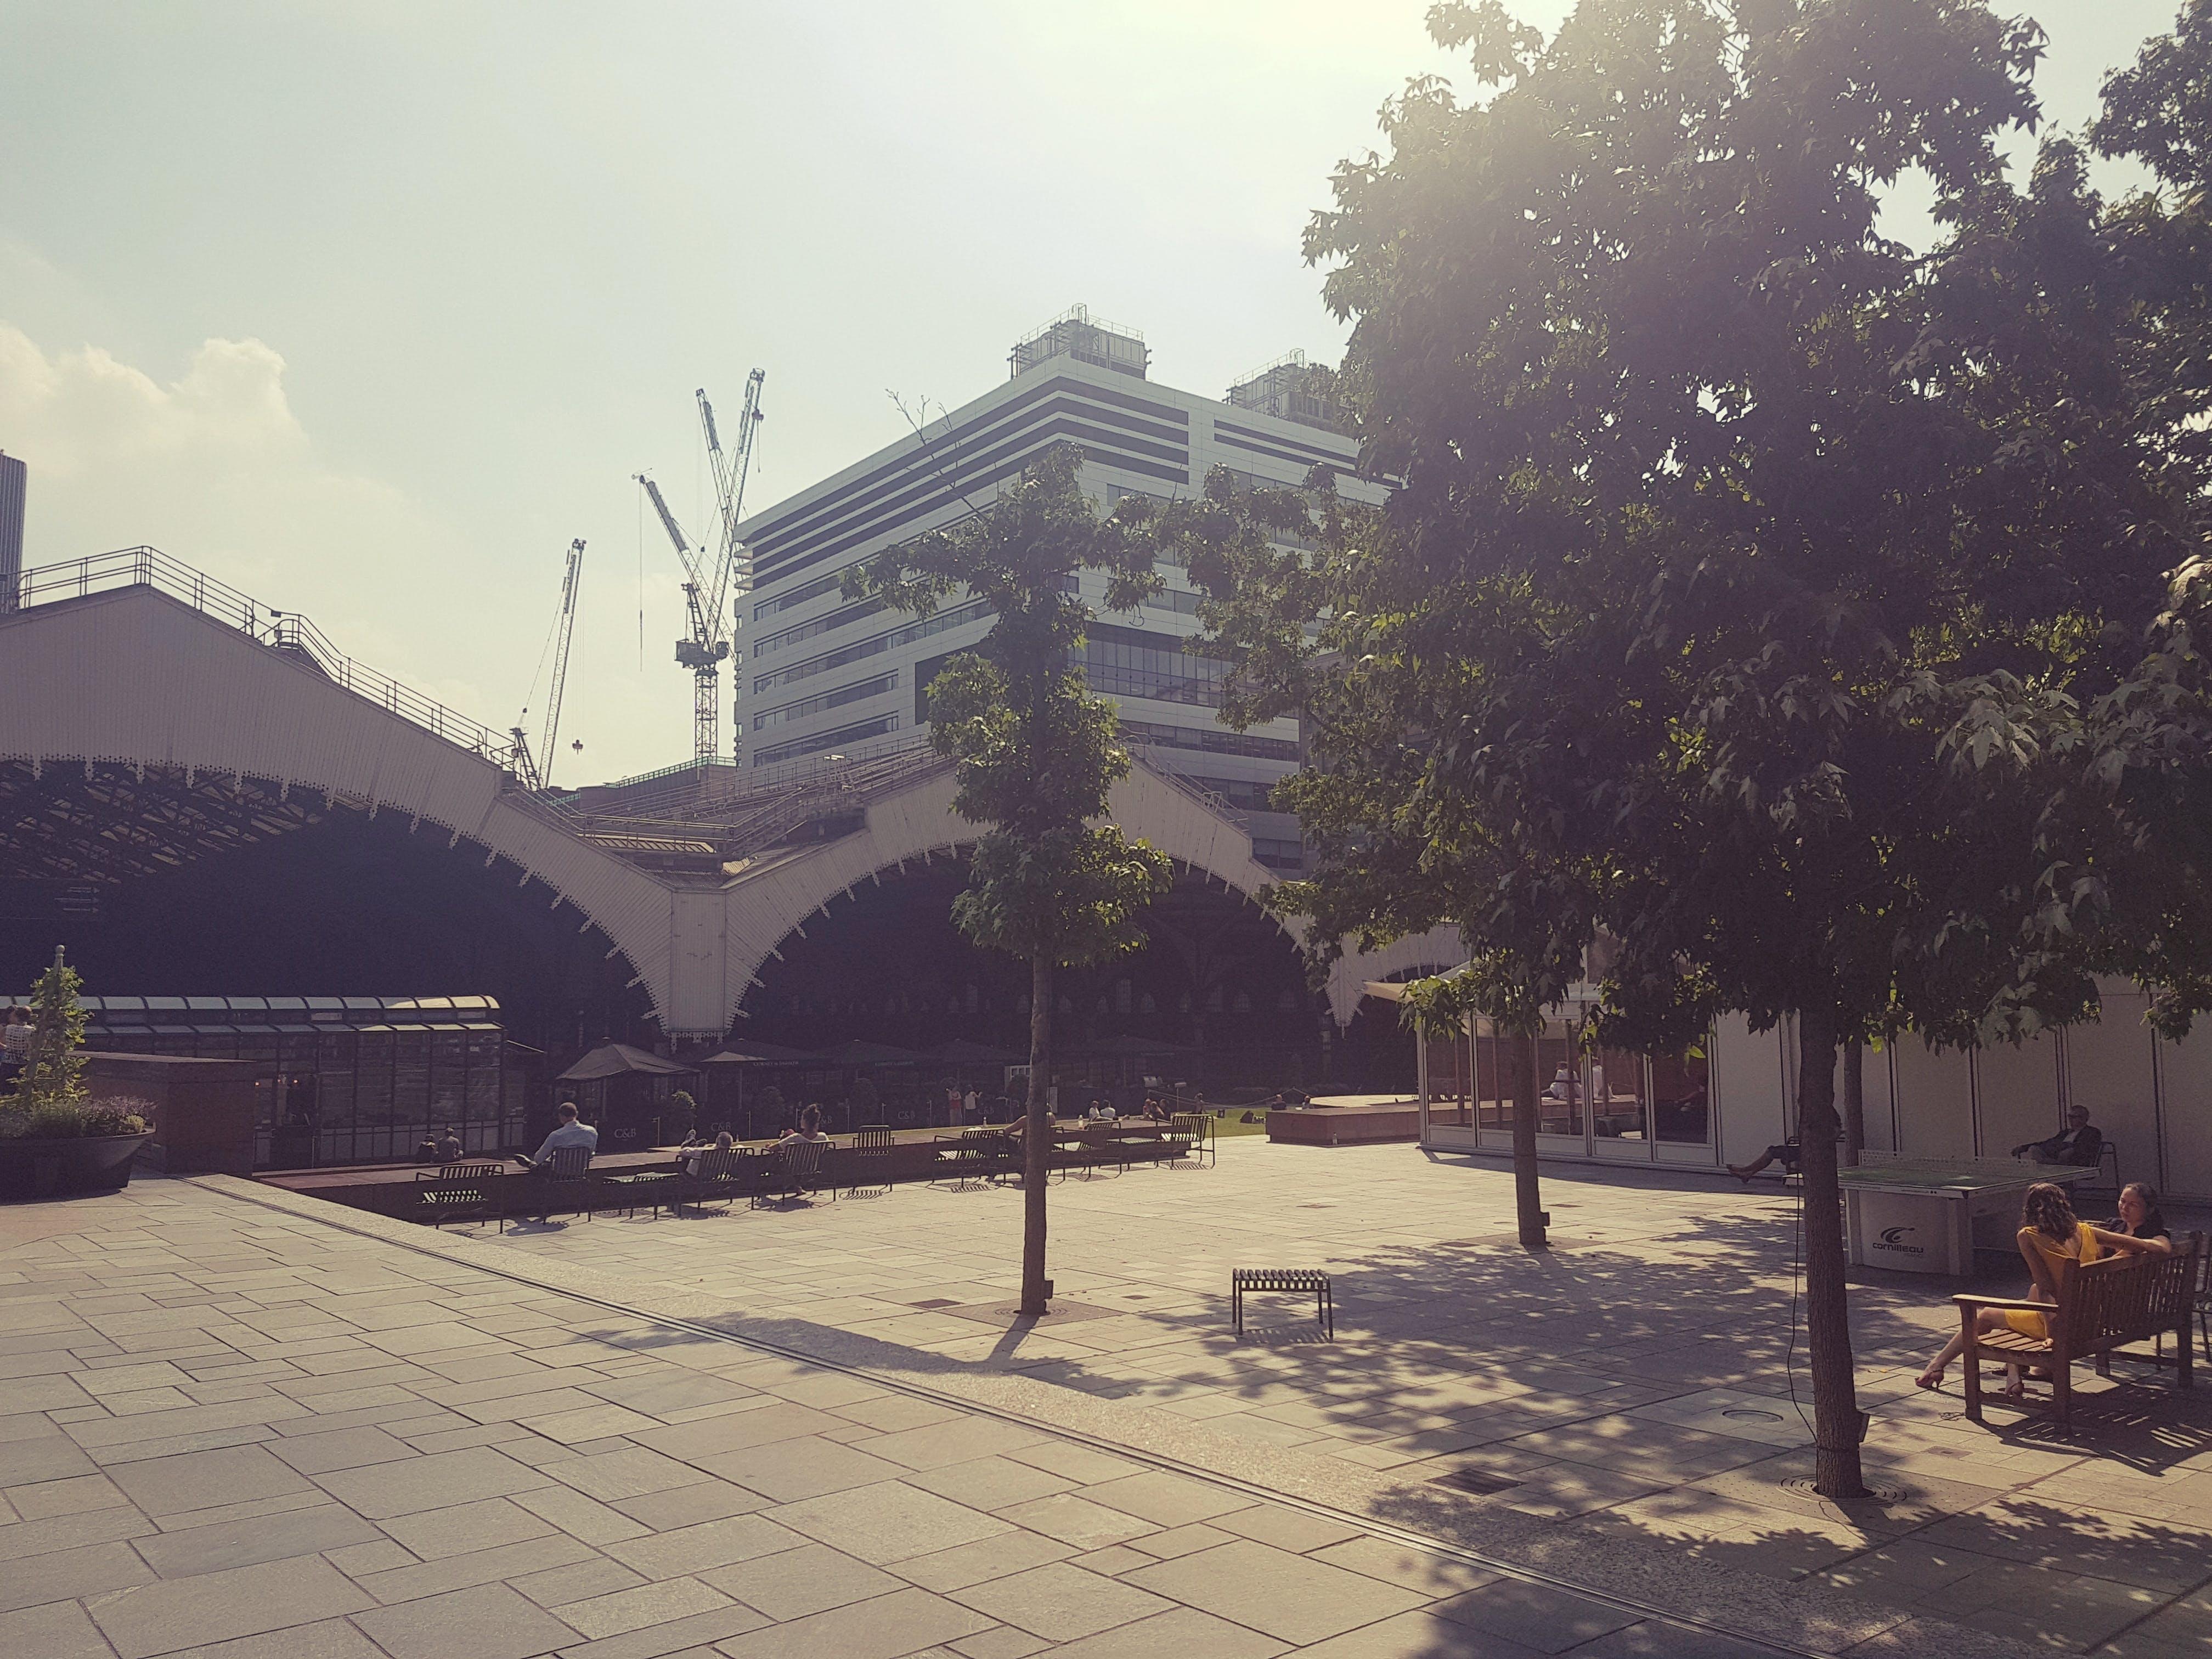 Free stock photo of summer, summer sun, train station